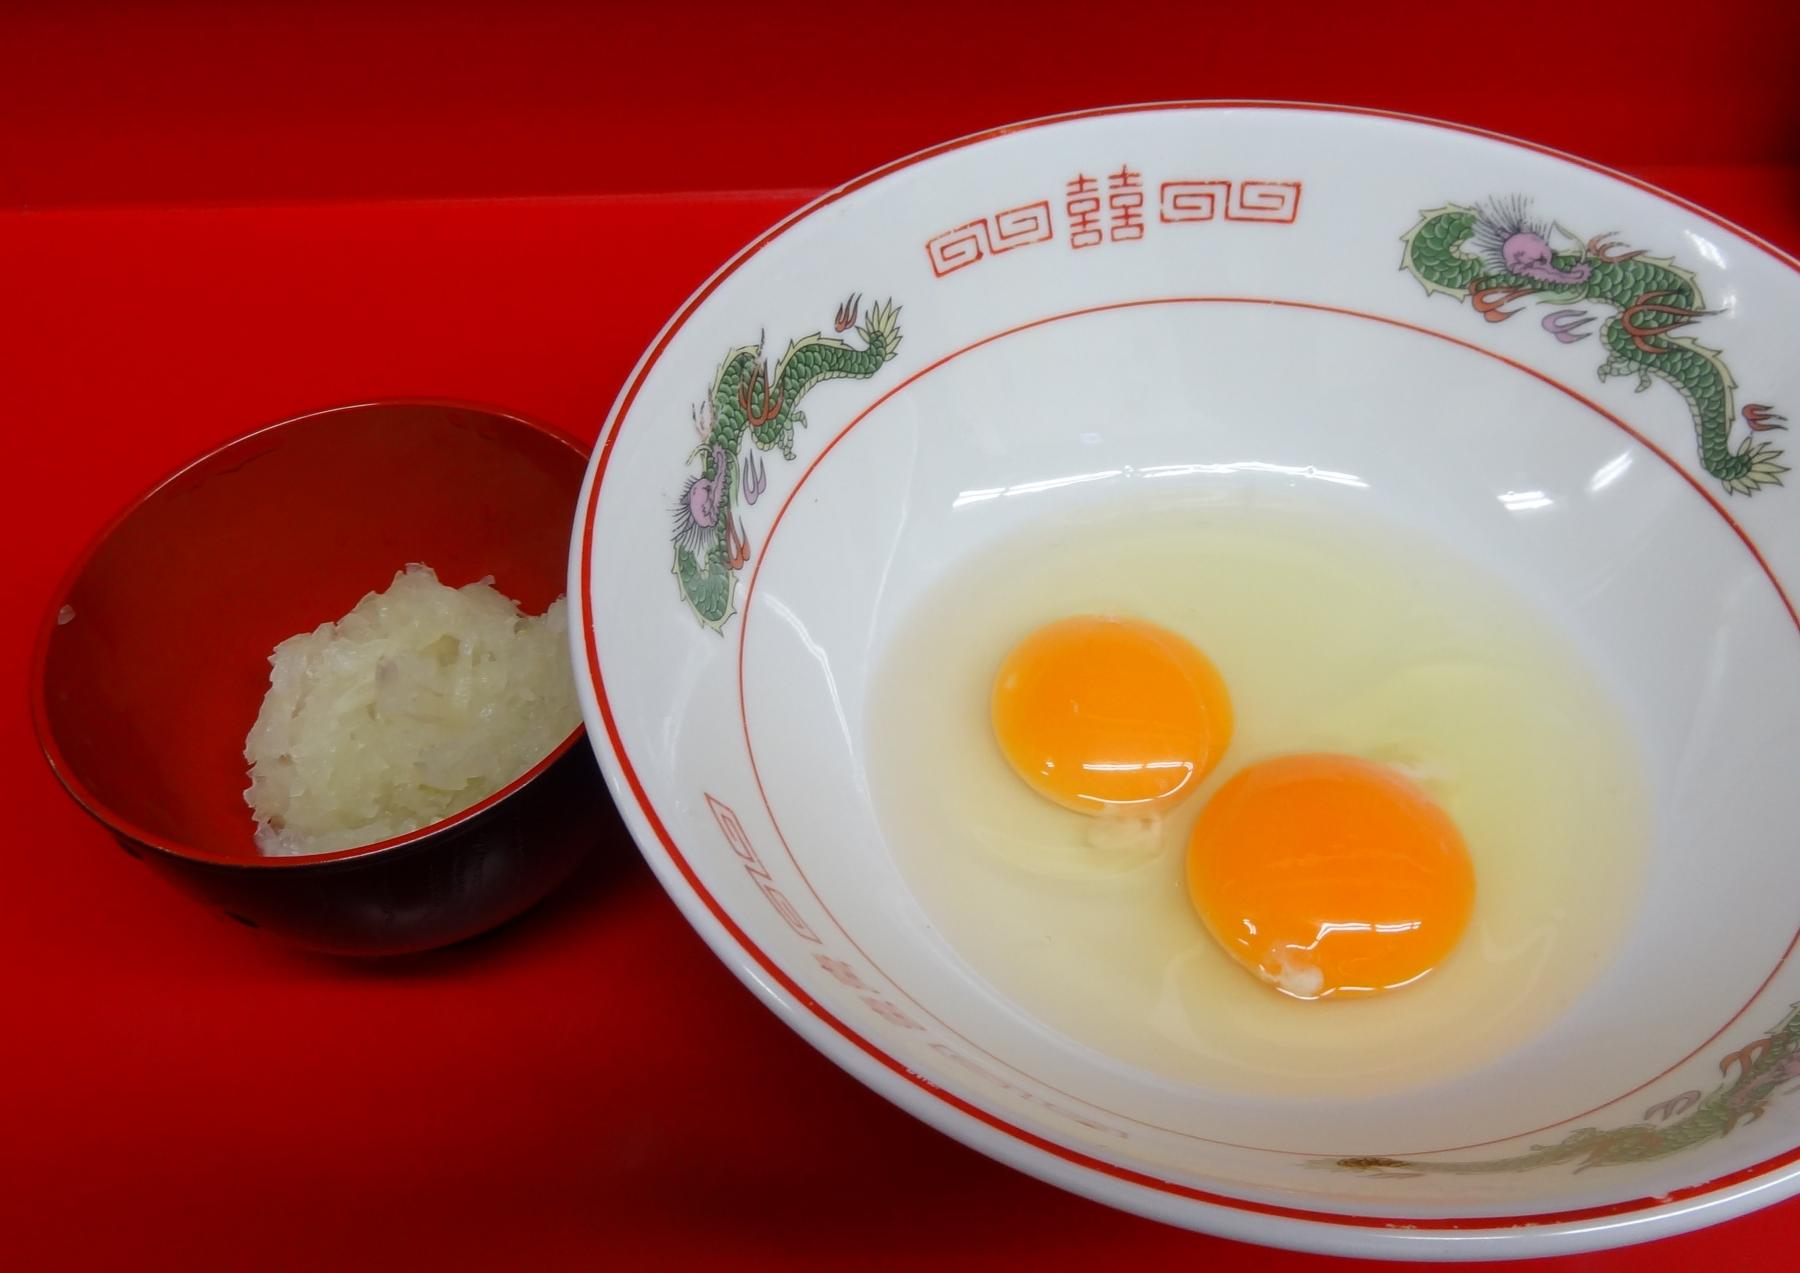 20120409002fujisawa.jpg